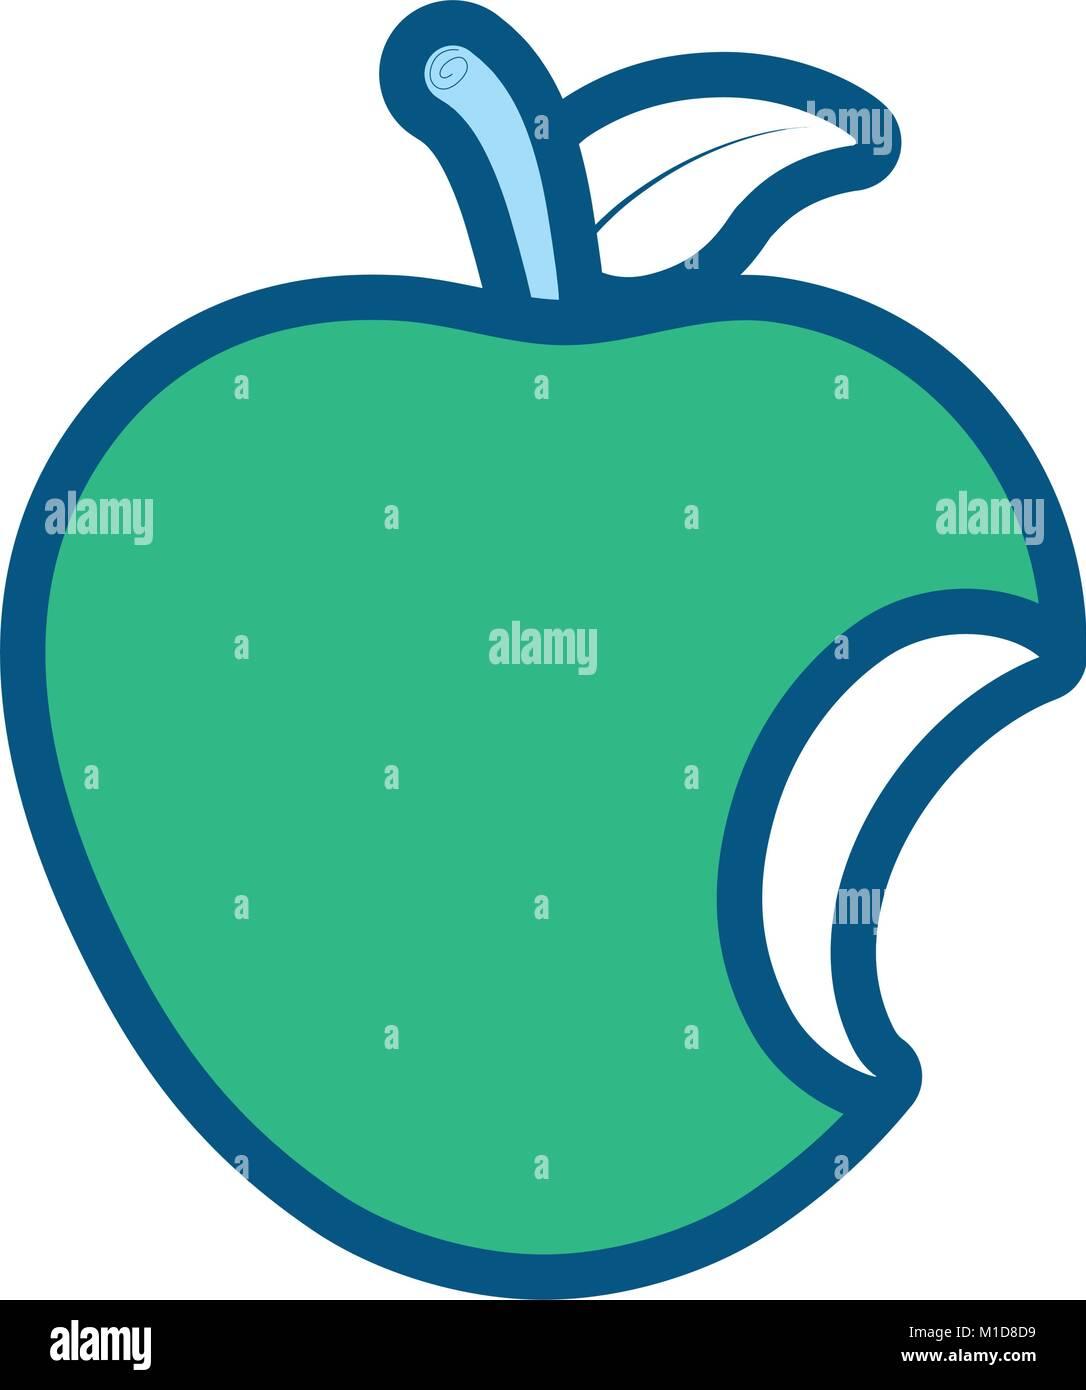 Bitten apple stock vector images alamy apple vector illustration stock vector buycottarizona